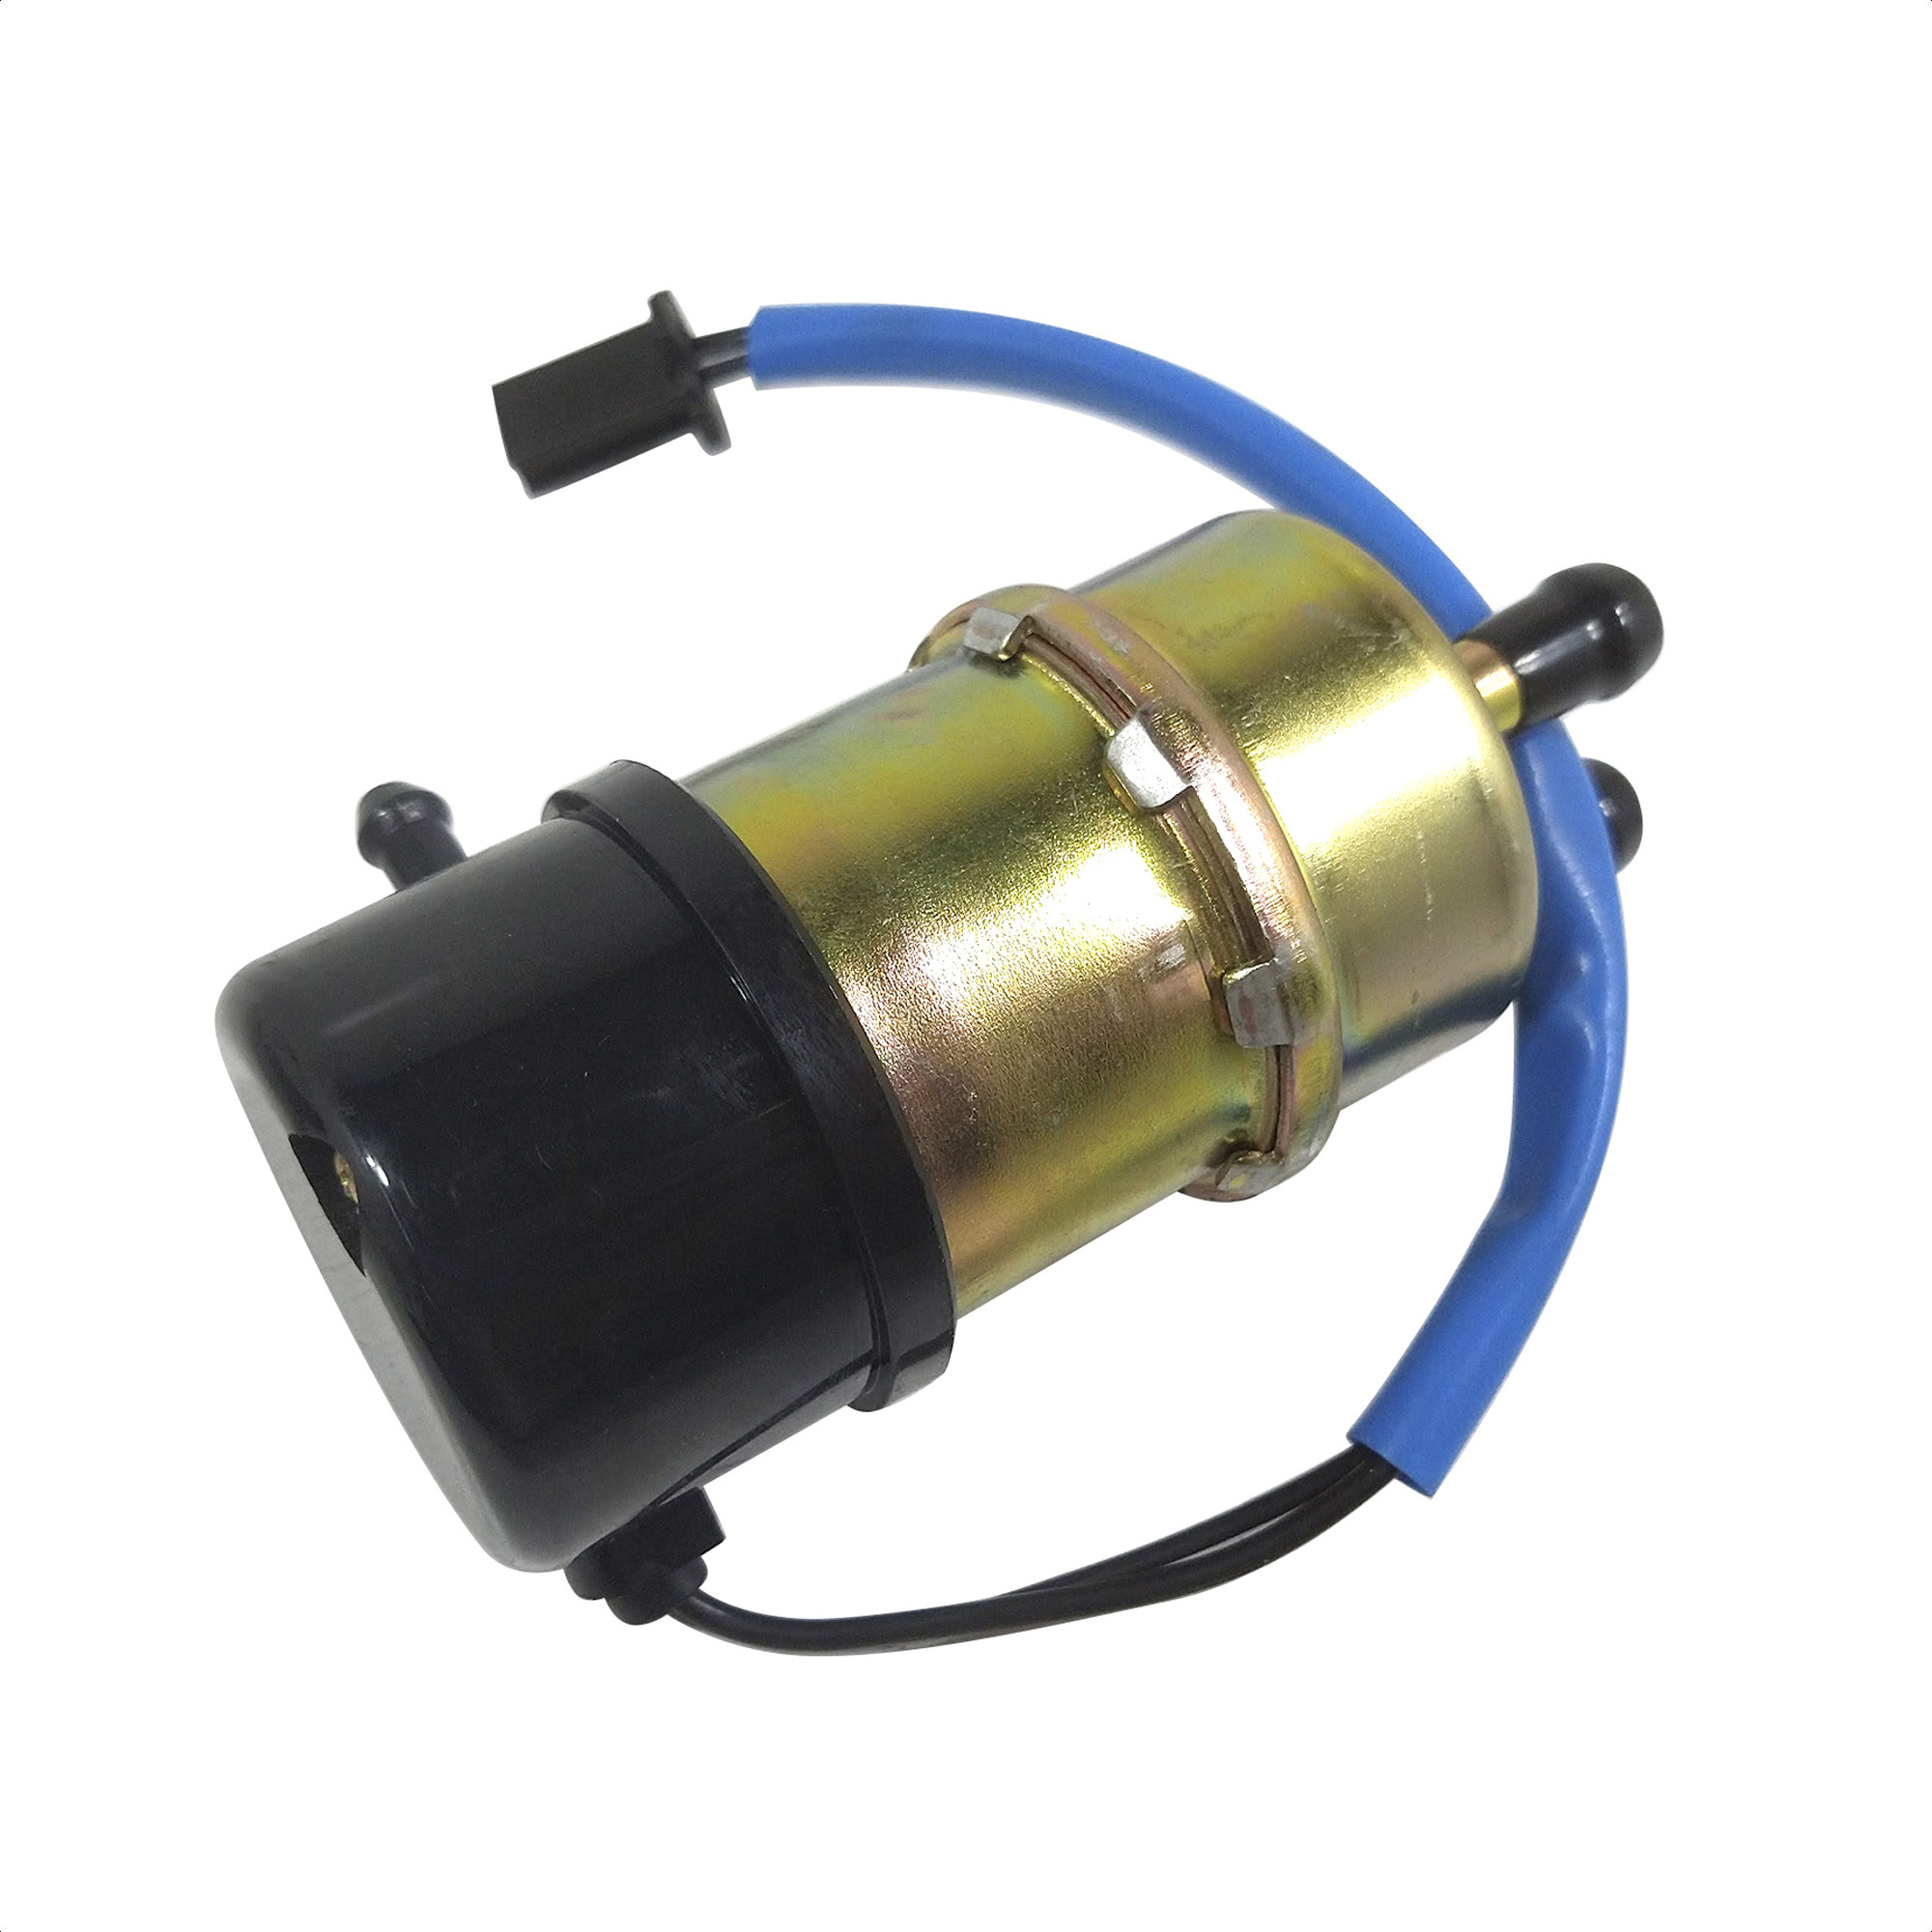 Bomba De Combustible Moto Honda Cbr 900 Fispa 20204